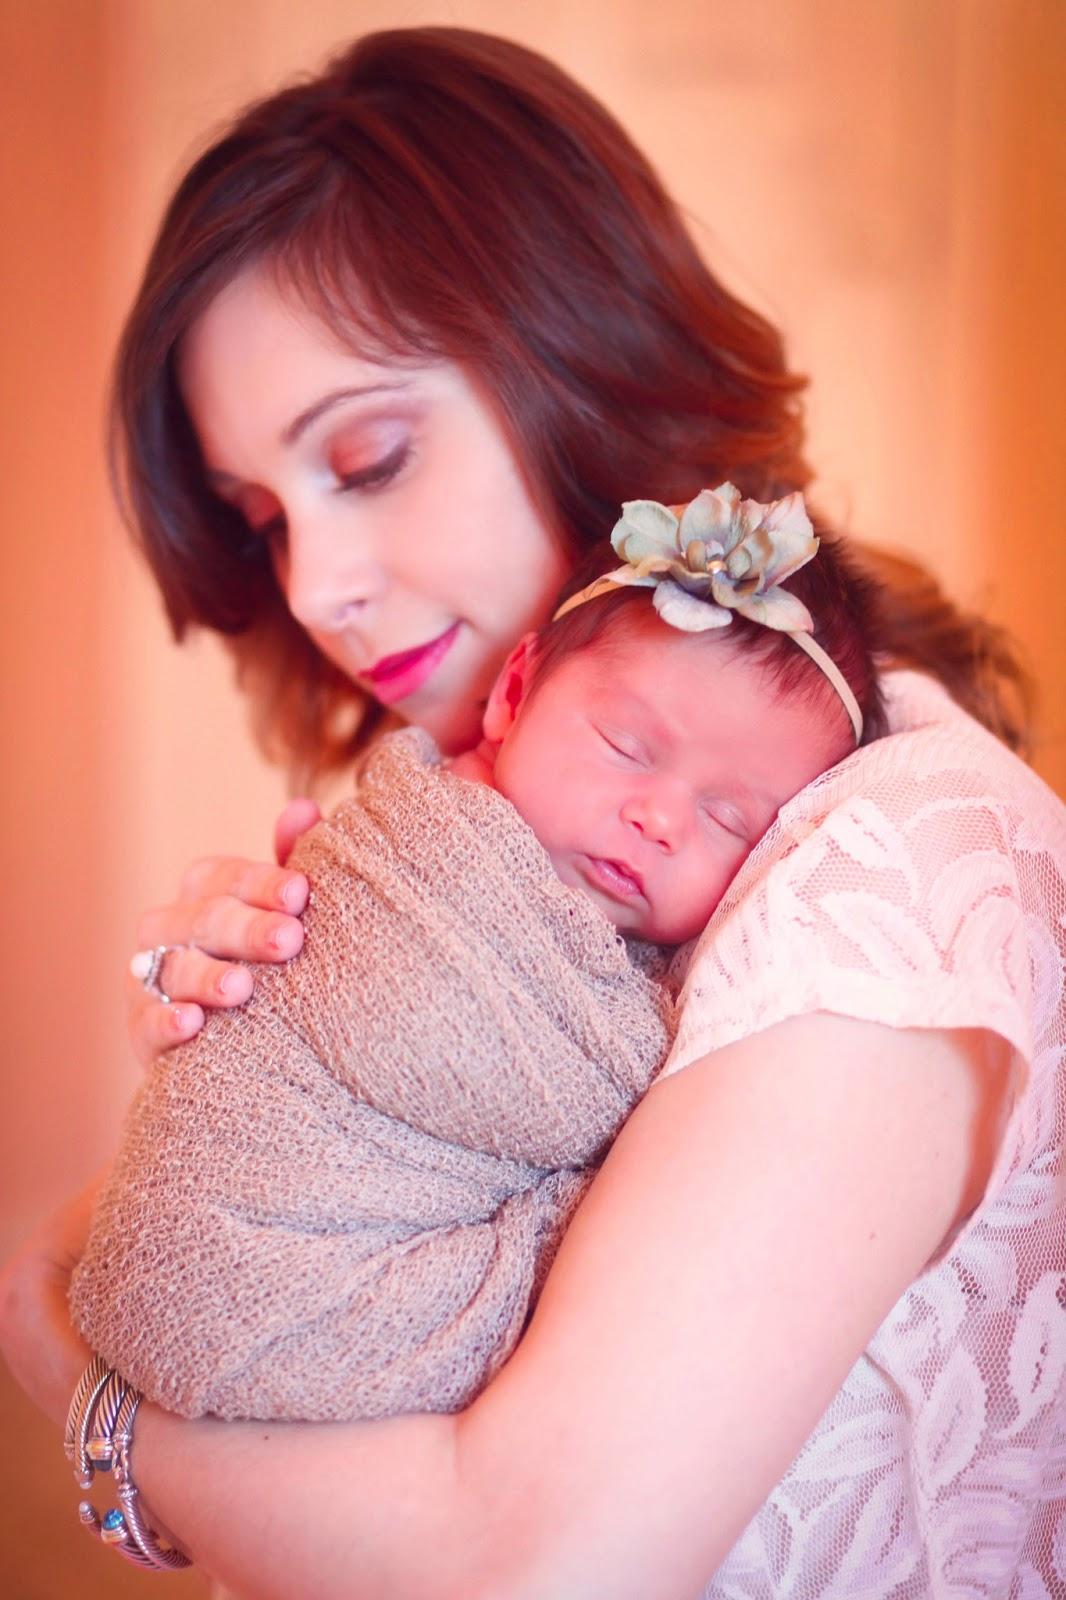 Baby Jewel Nude Photos 93